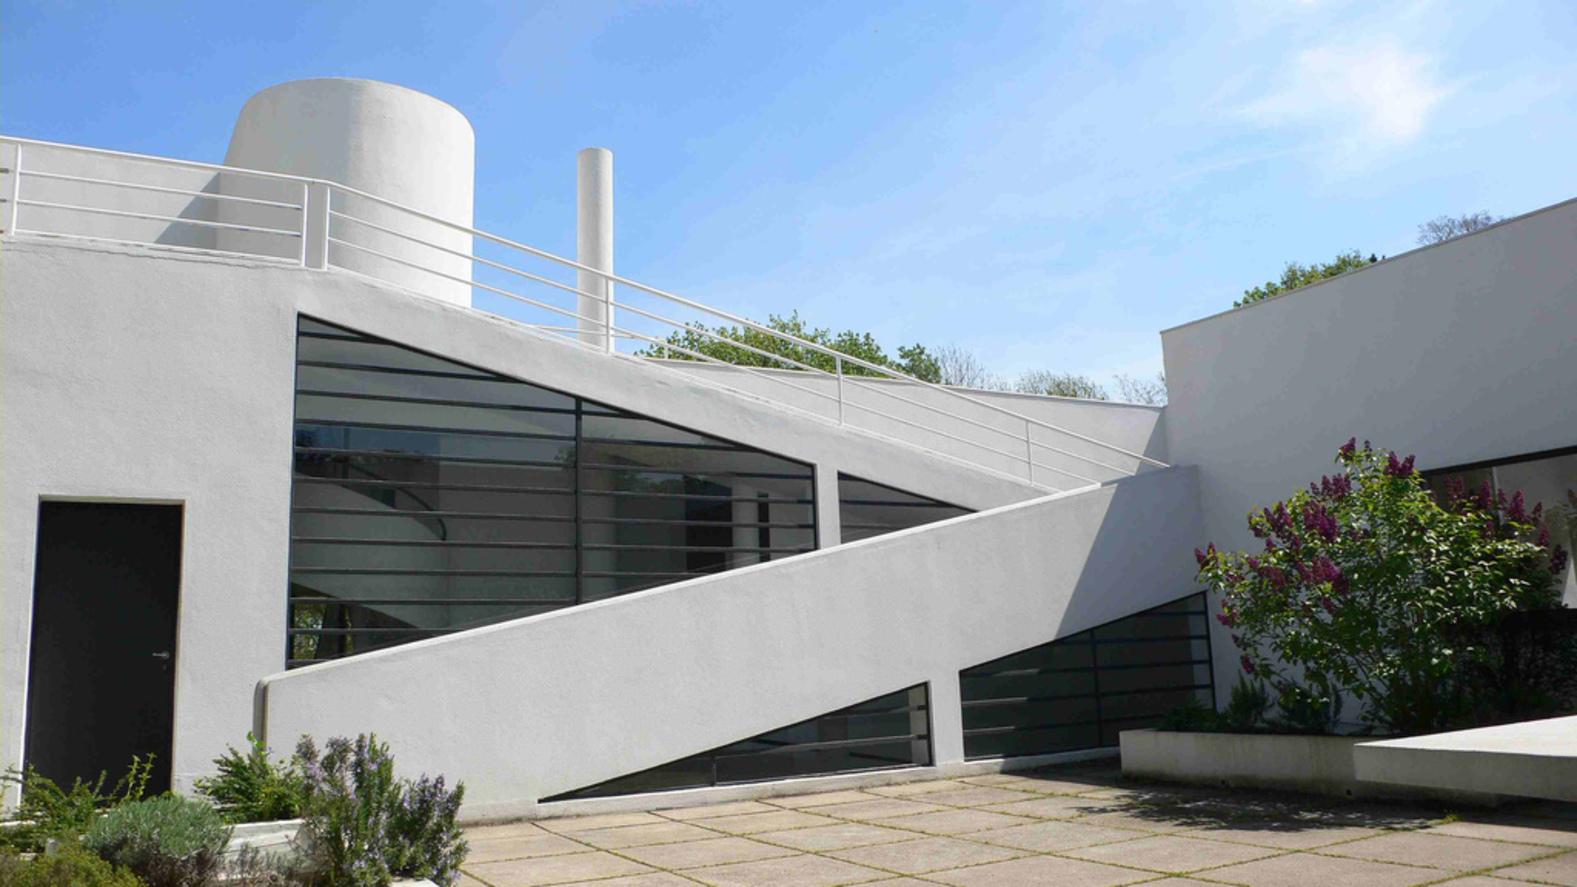 Bread pty ltd sublime design le corbusier 39 s villa savoye - Le corbusier villa savoye ...